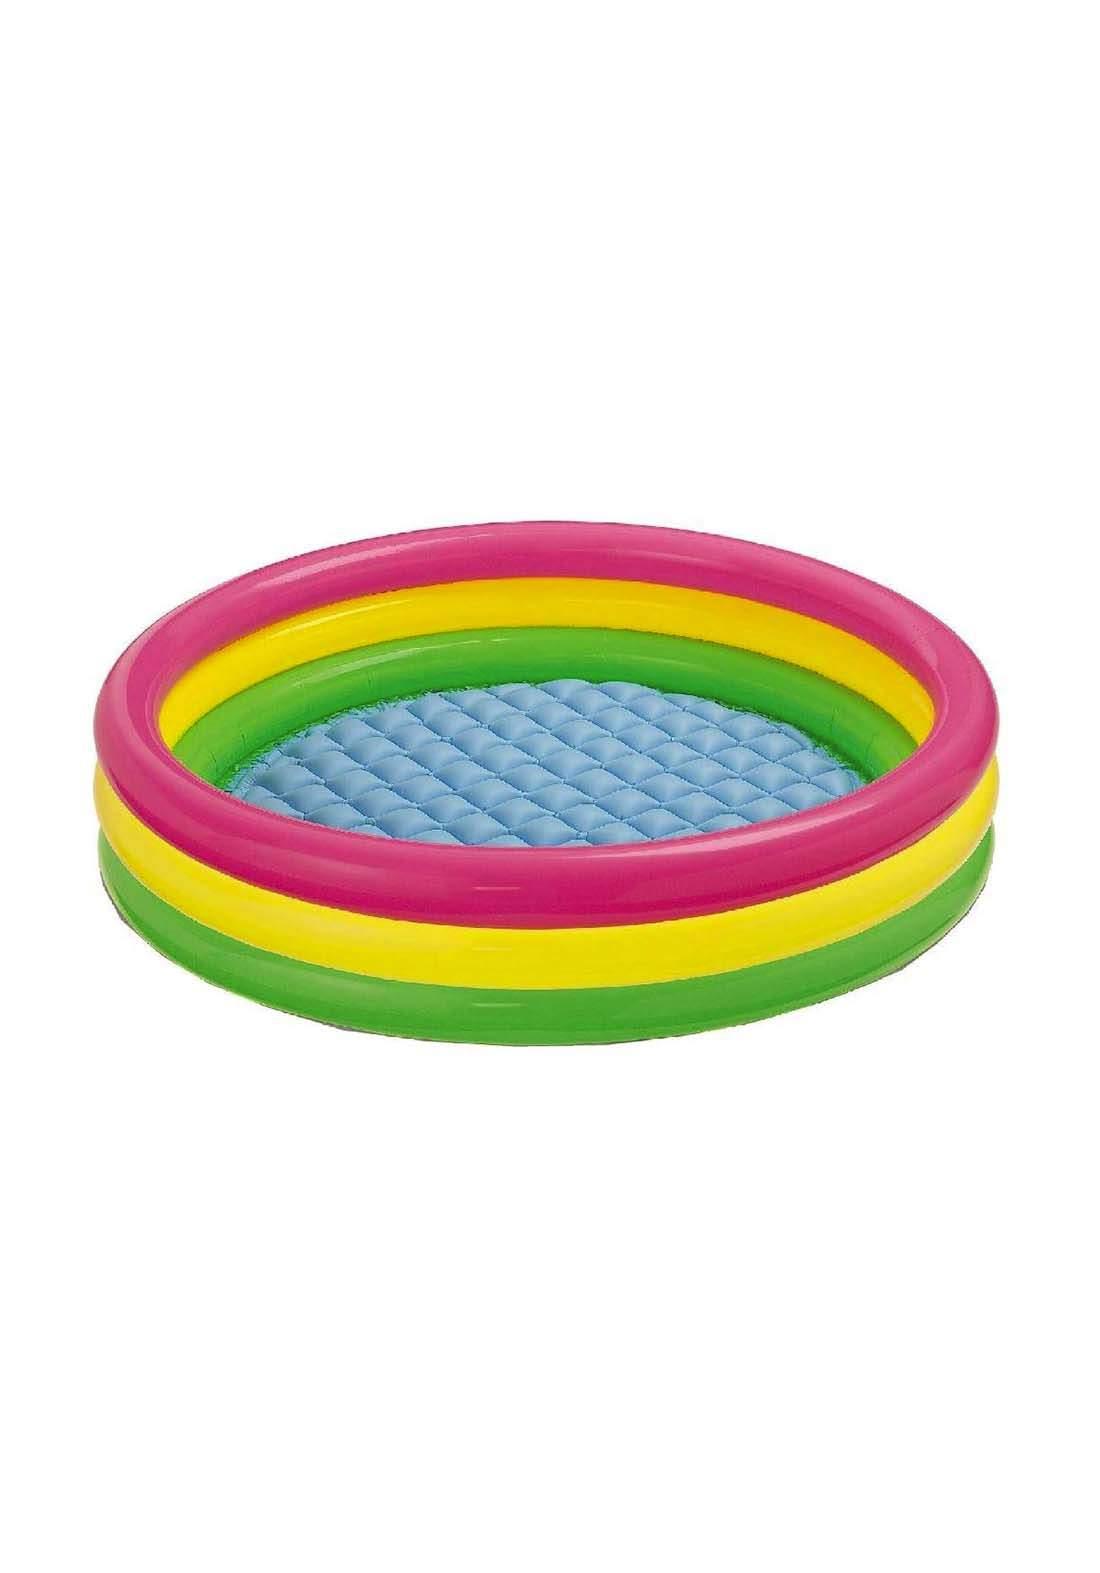 Intex 57422NP 3-Ring Inflatable pool مسبح